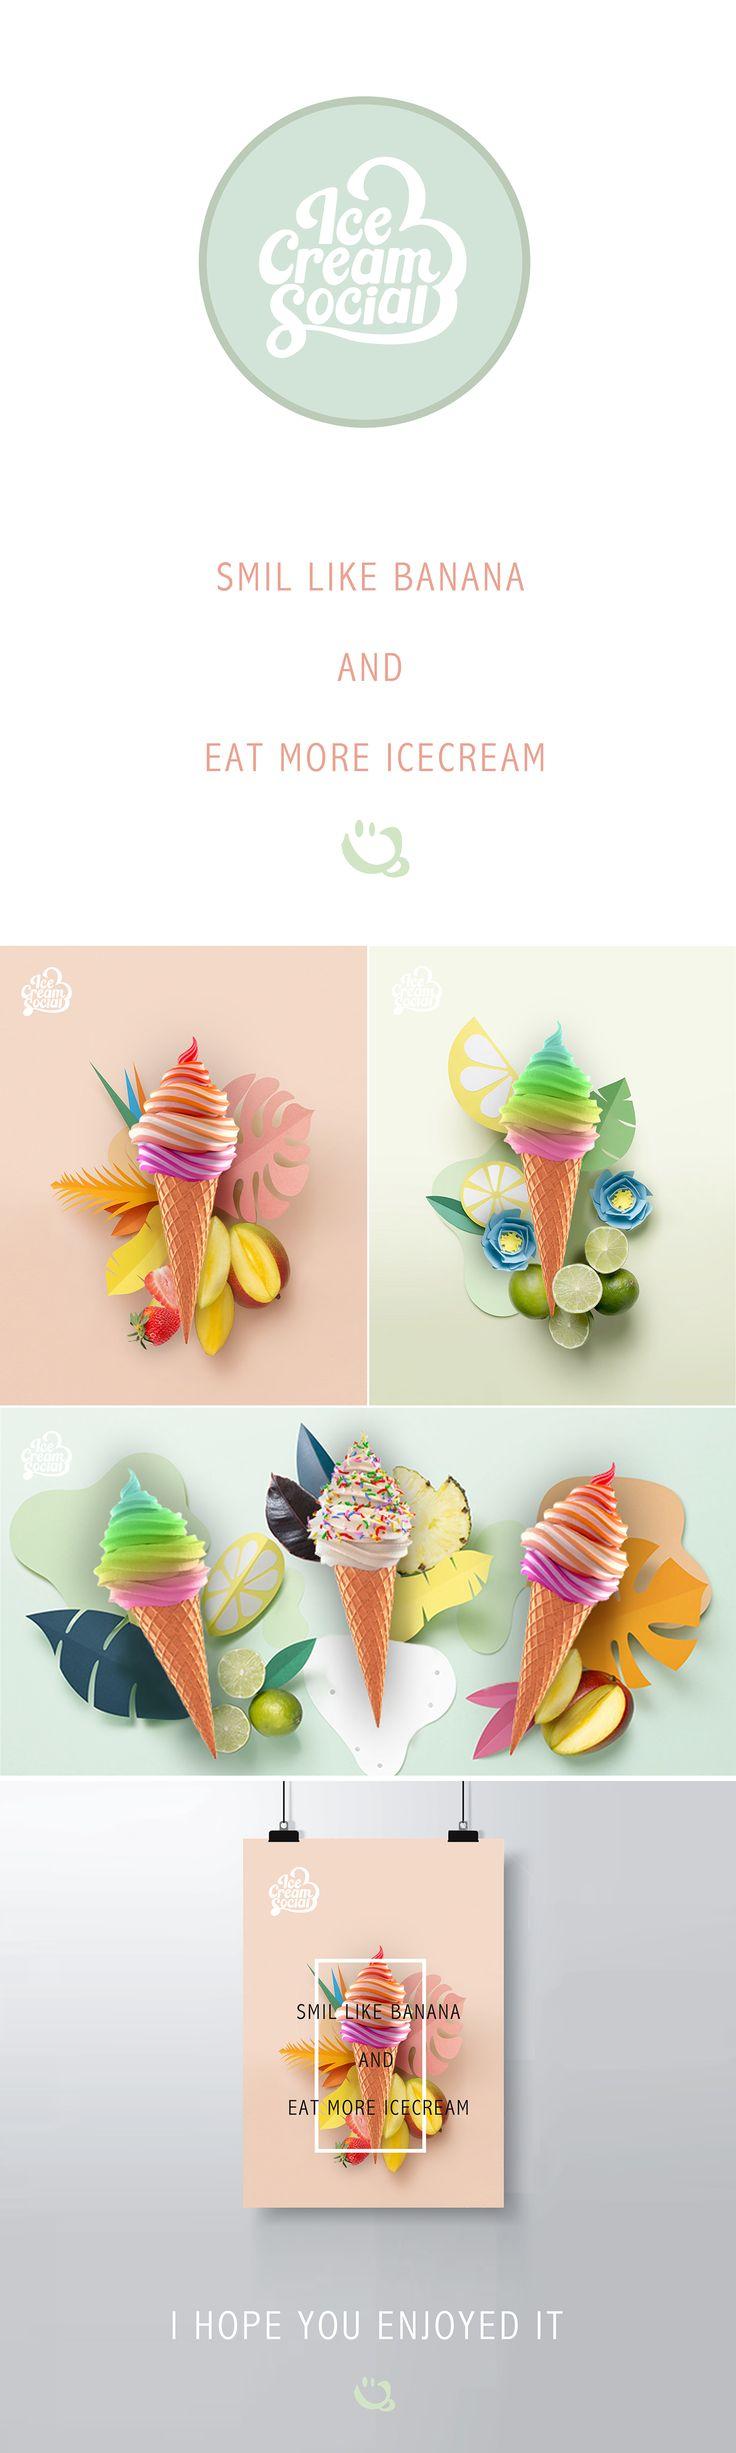 ice cream - poster work on Behance